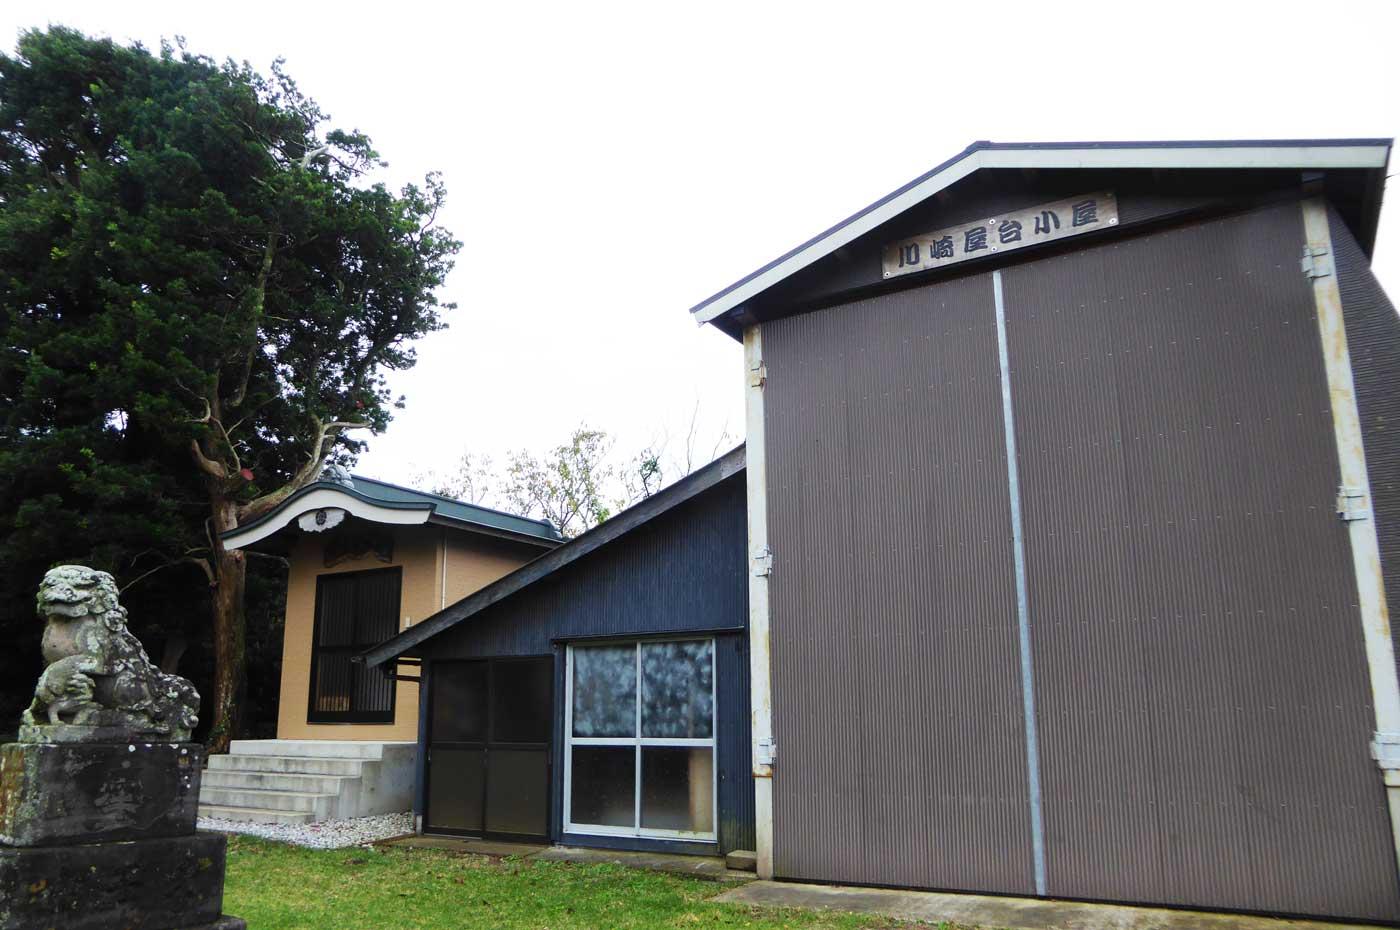 屋台小屋と神輿小屋の画像